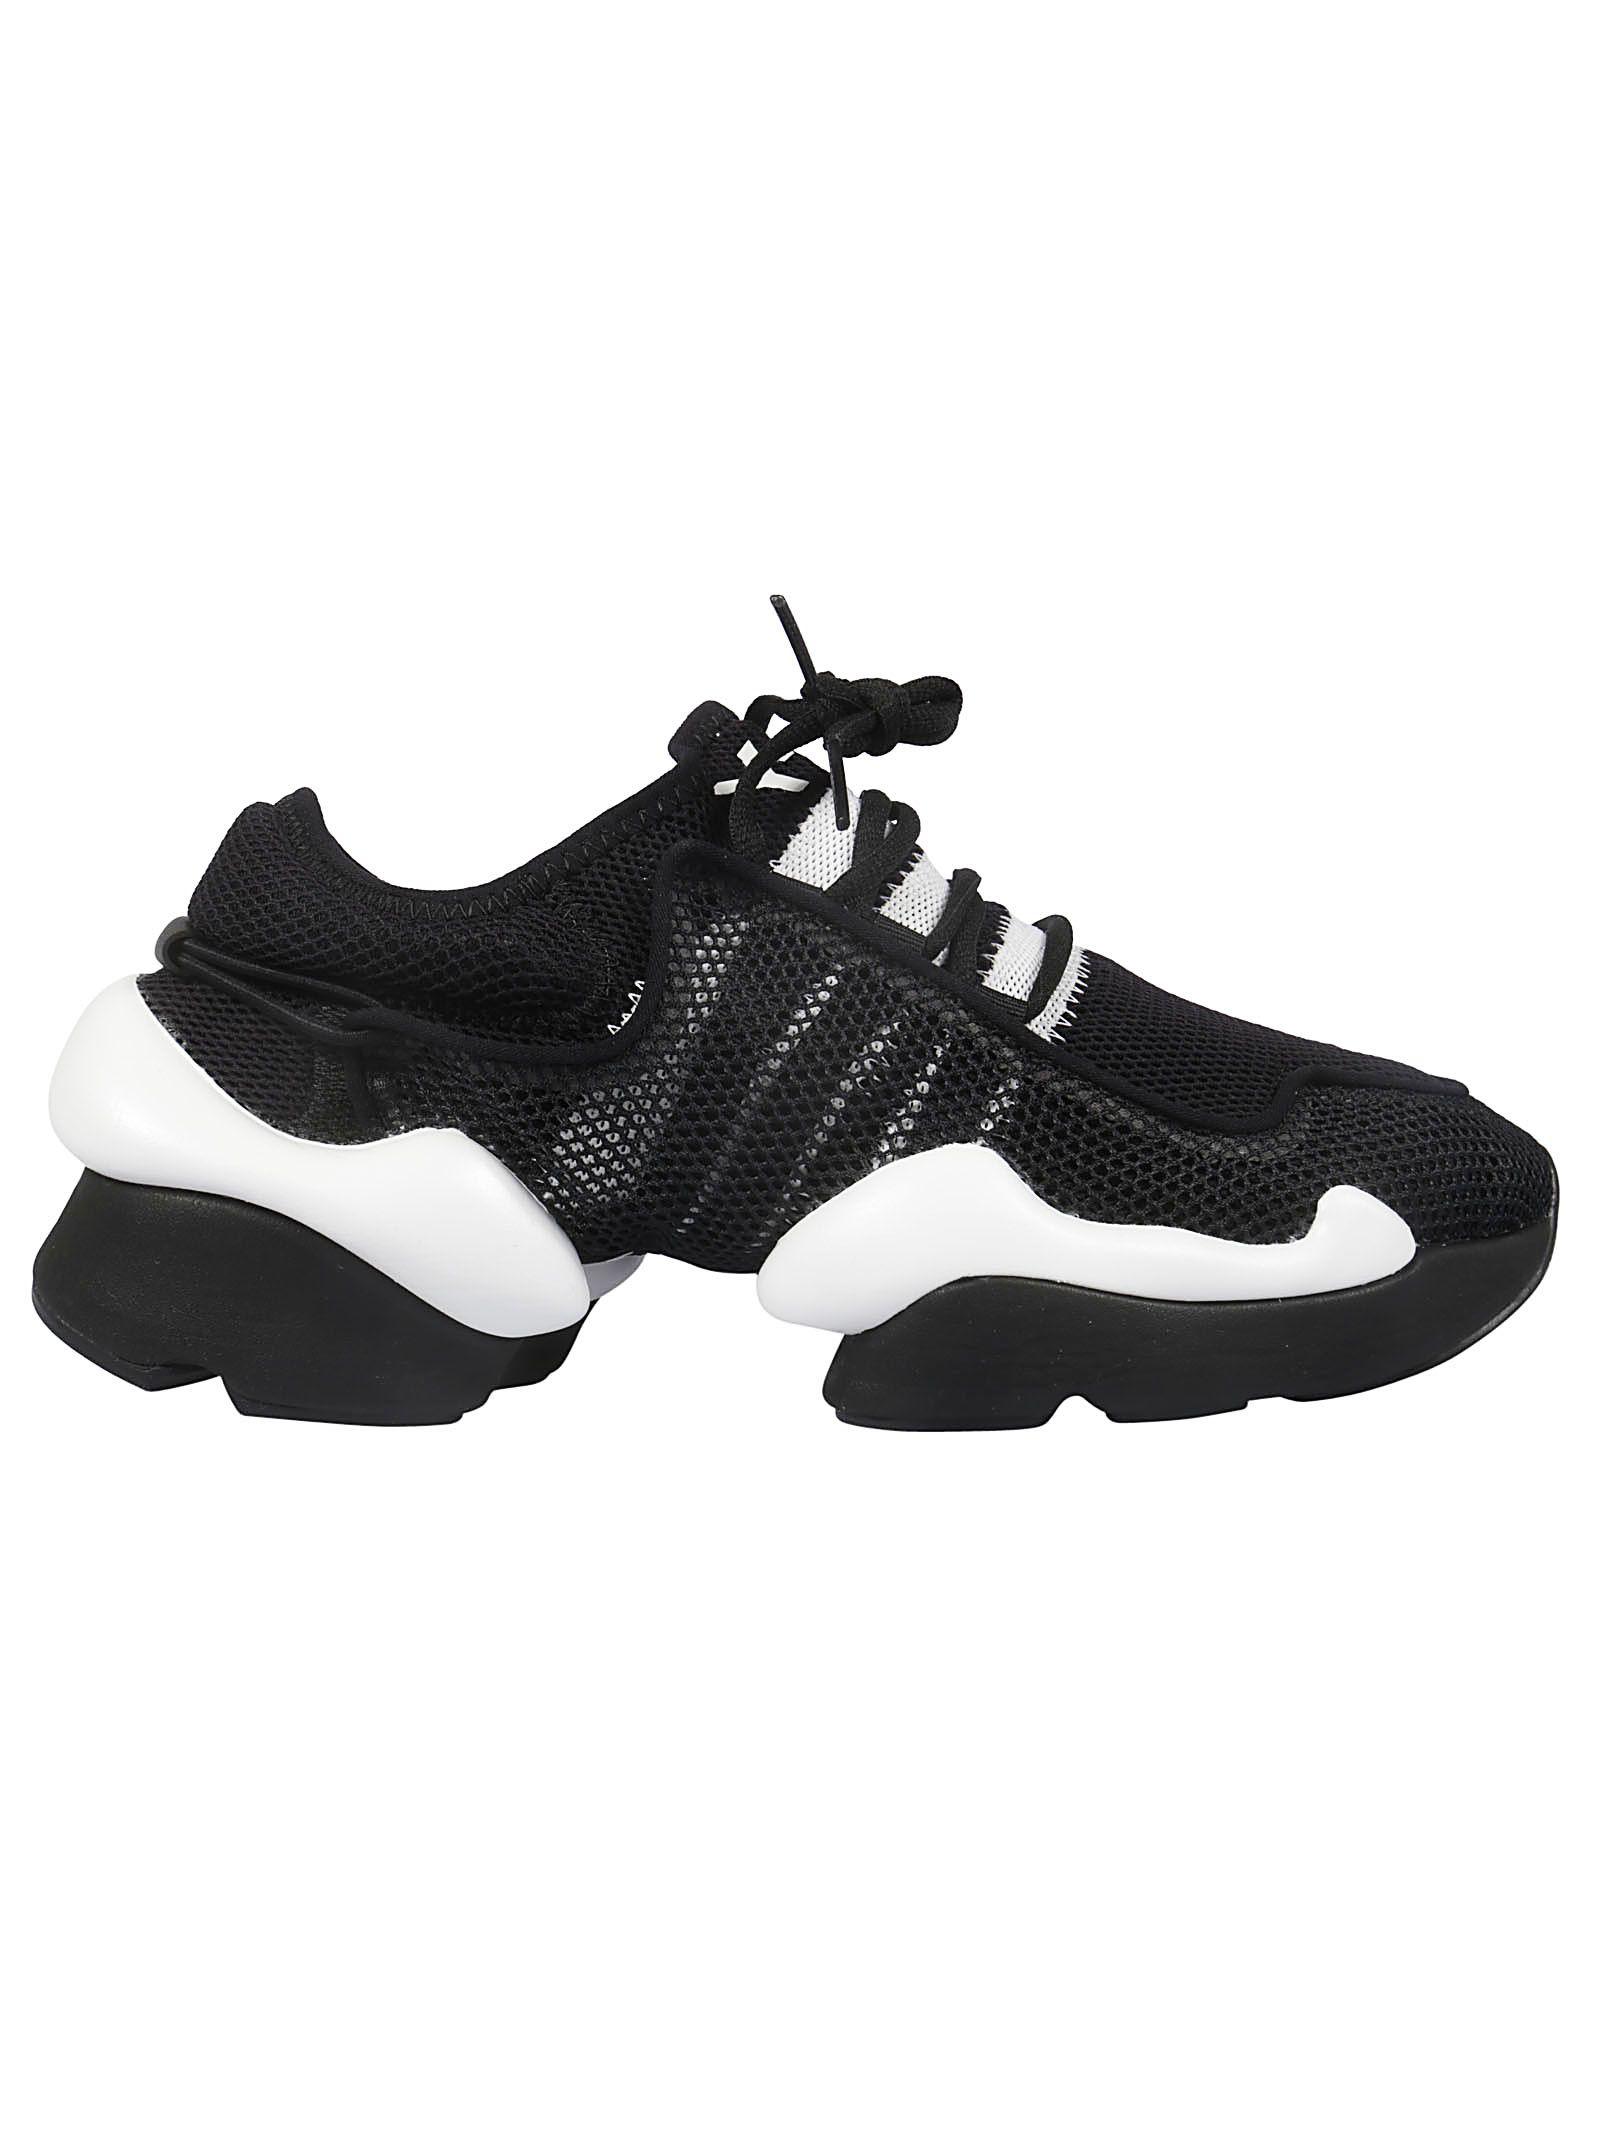 94eda608746cf Y-3 Kaiwa Pod Mesh Sneakers - Black